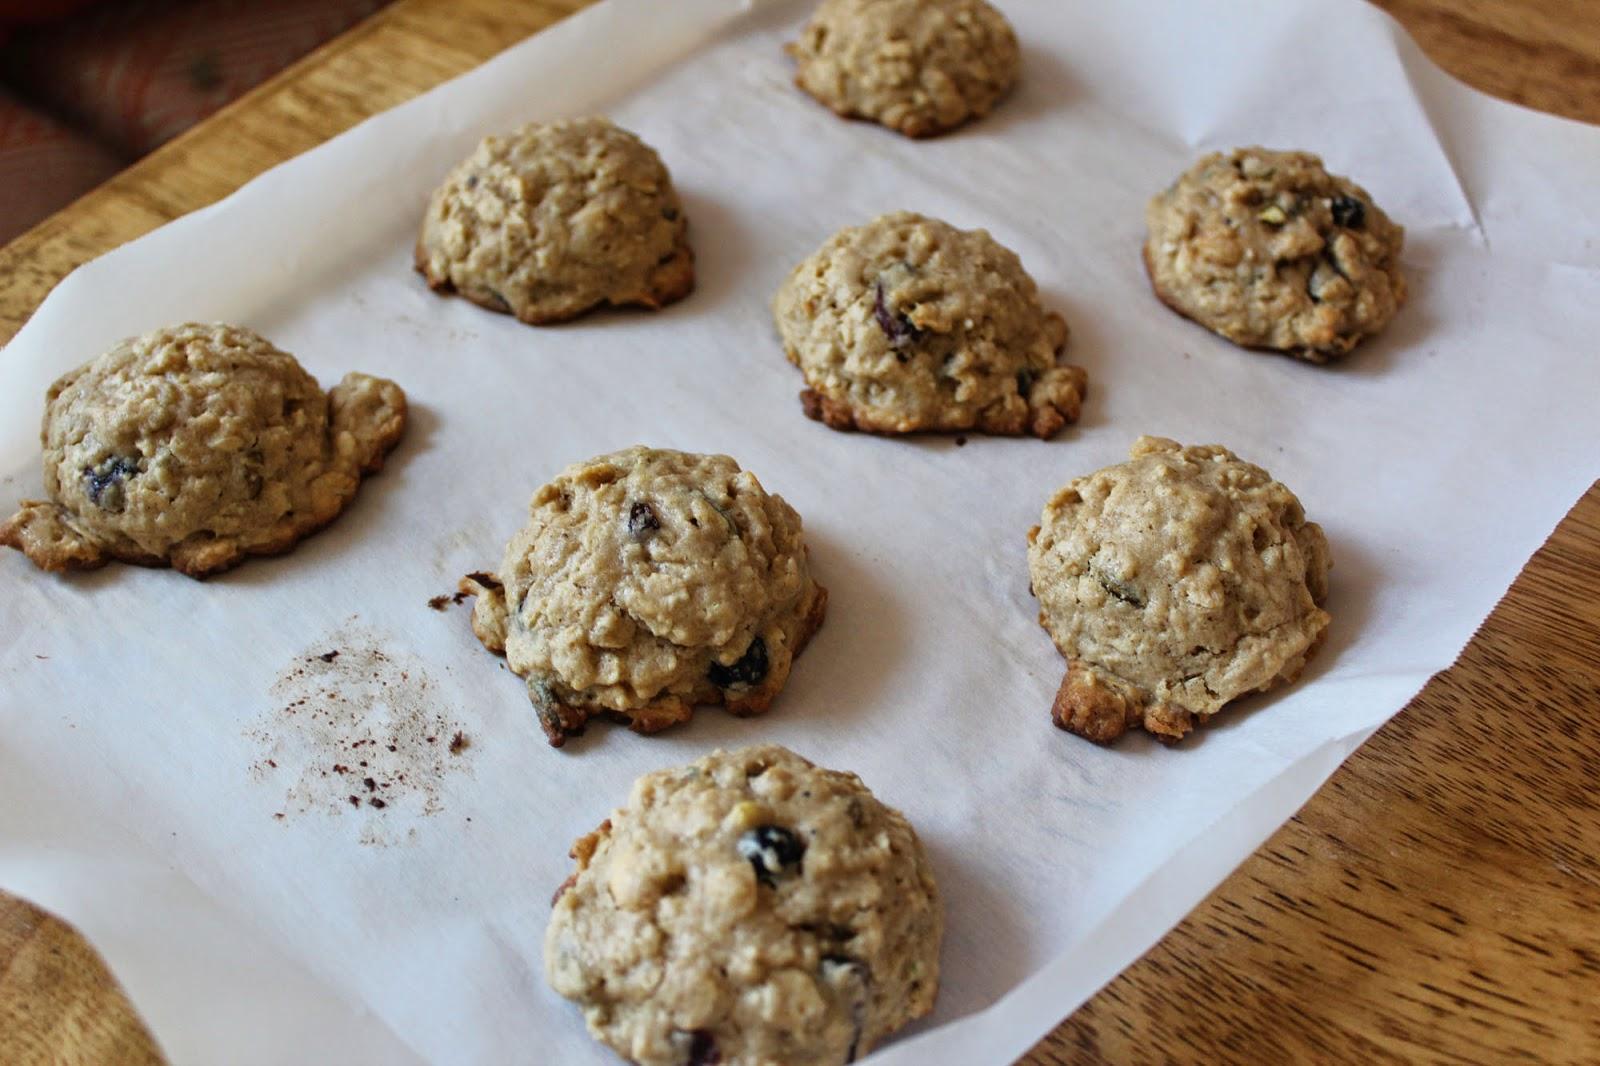 Trailways Oatmeal Cookies // Runaway Apricot